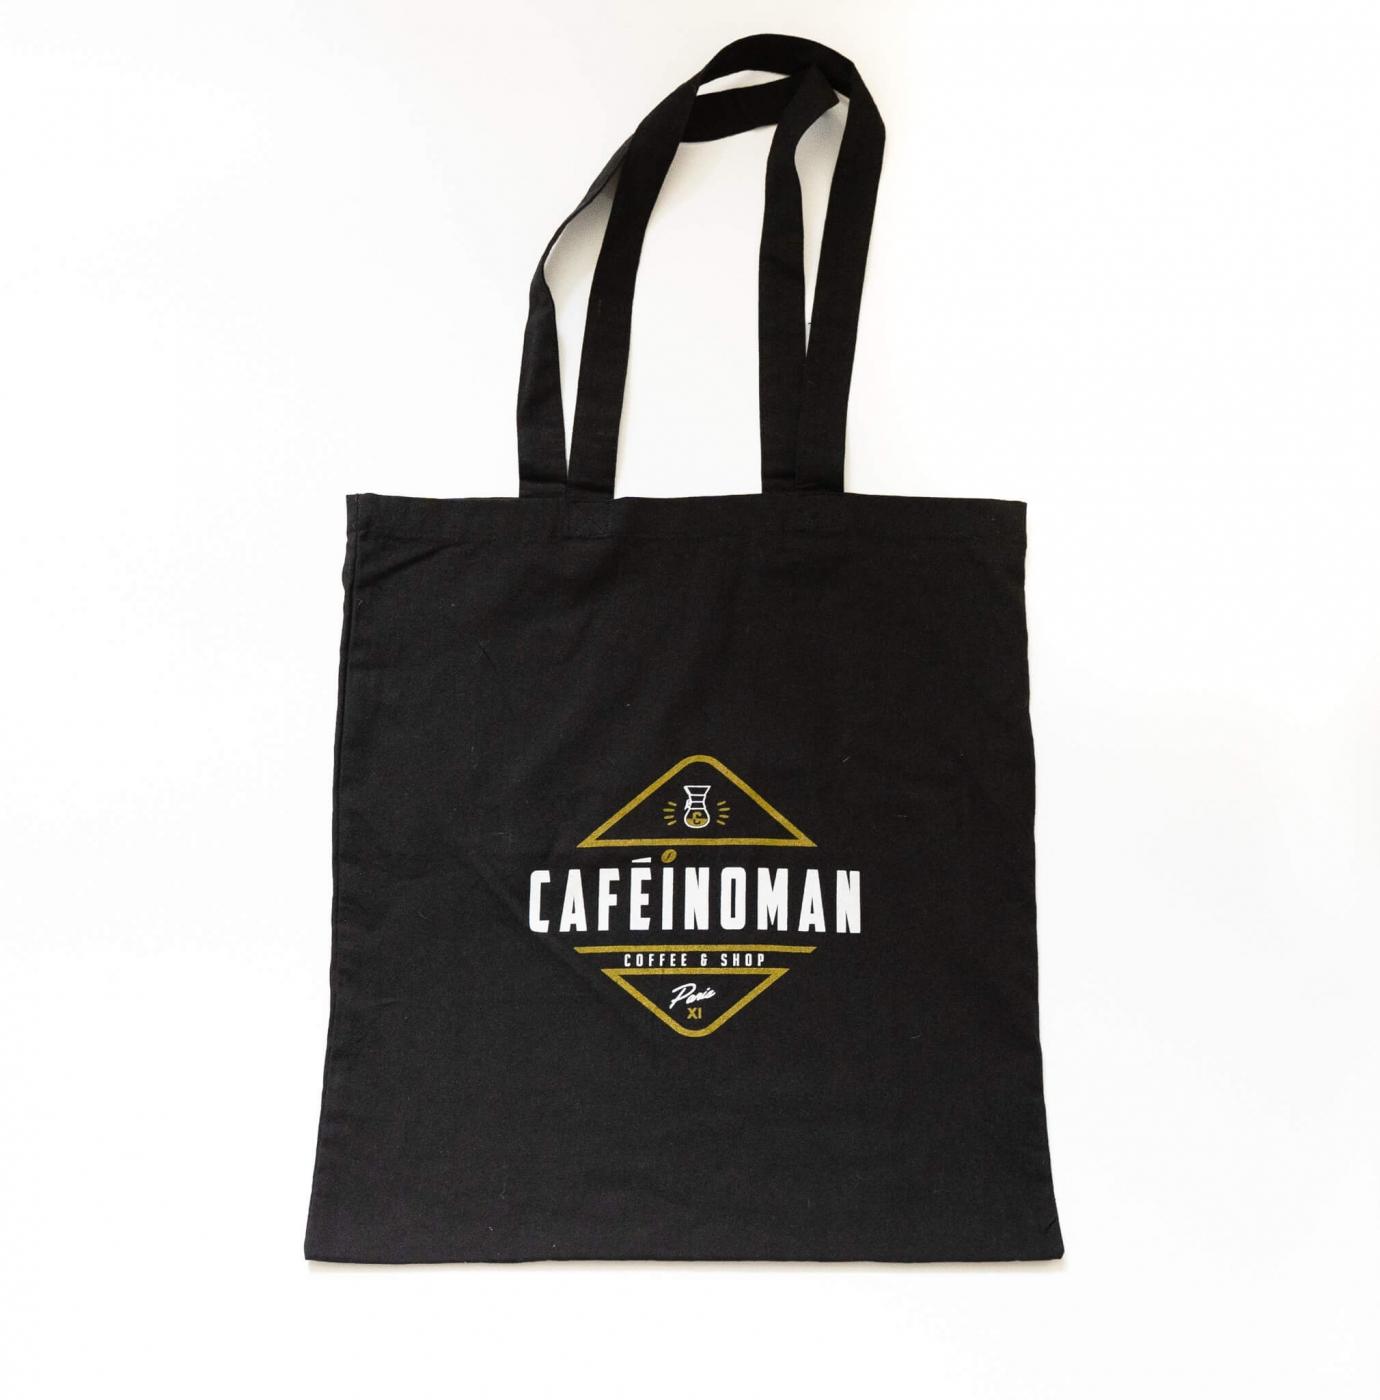 2021 07 27 tote bag noir fond blanc  cafeinoman